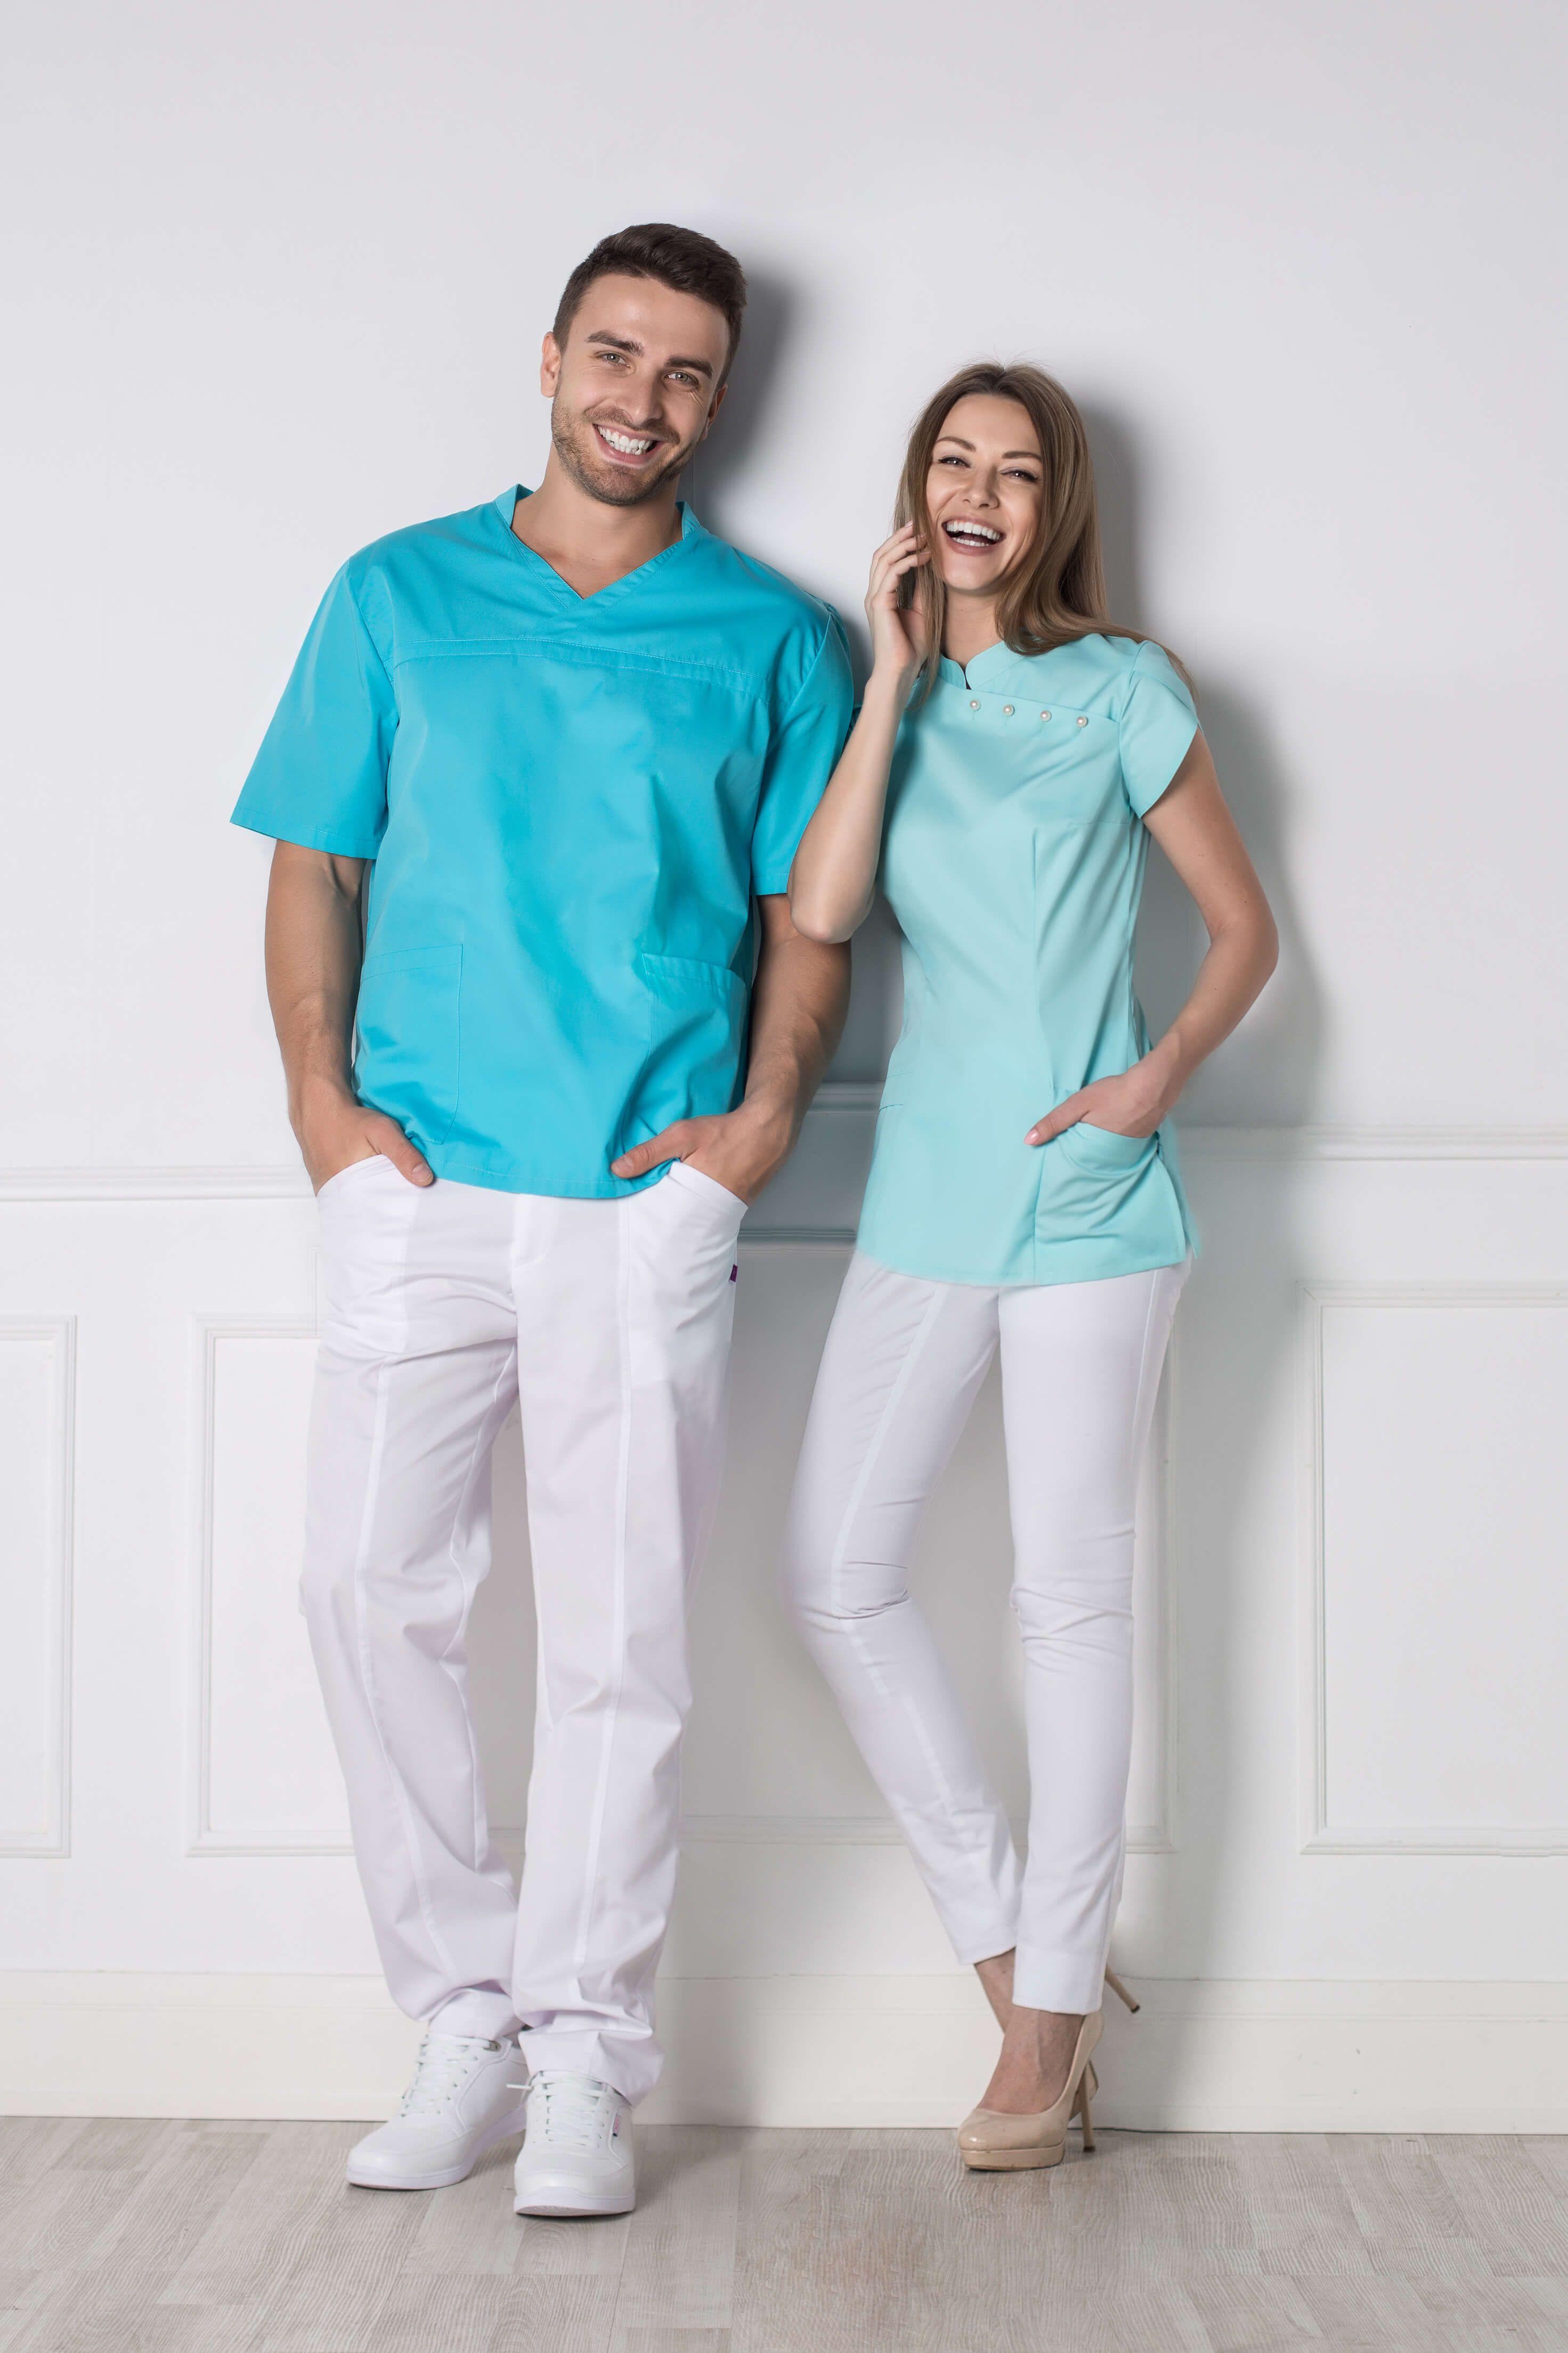 0fc78bf060c Лечи красиво - Медицинская одежда в корпоративном стиле